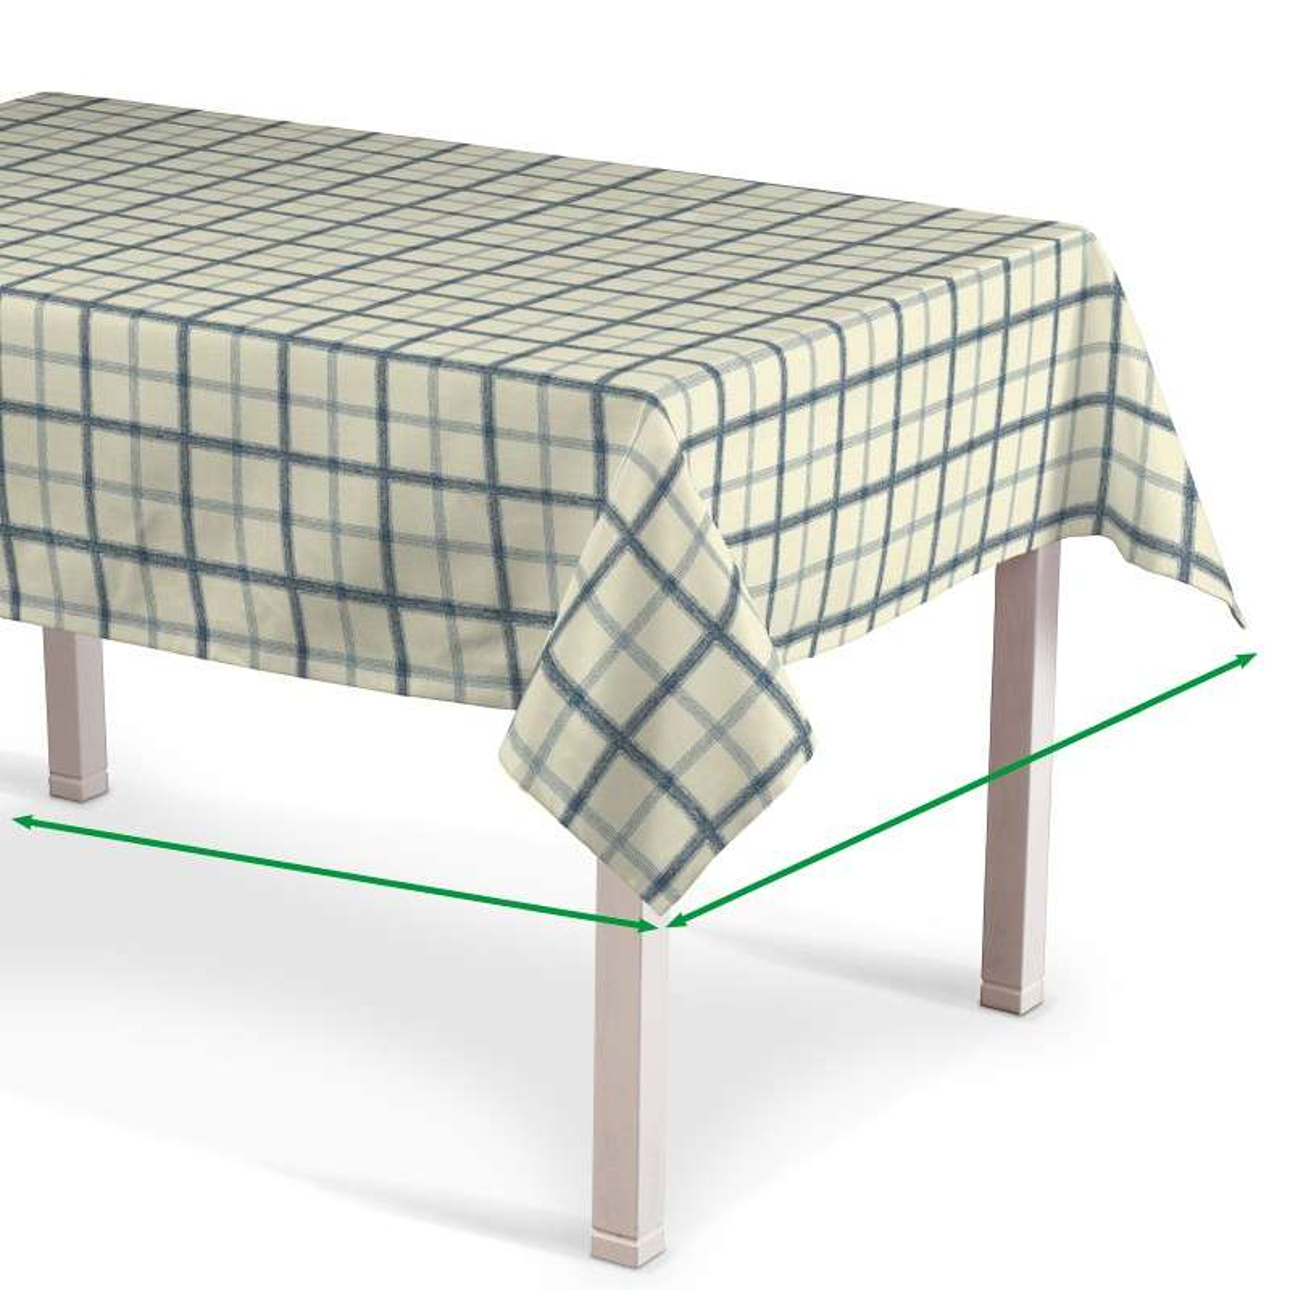 Rectangular tablecloth in collection Avinon, fabric: 131-66